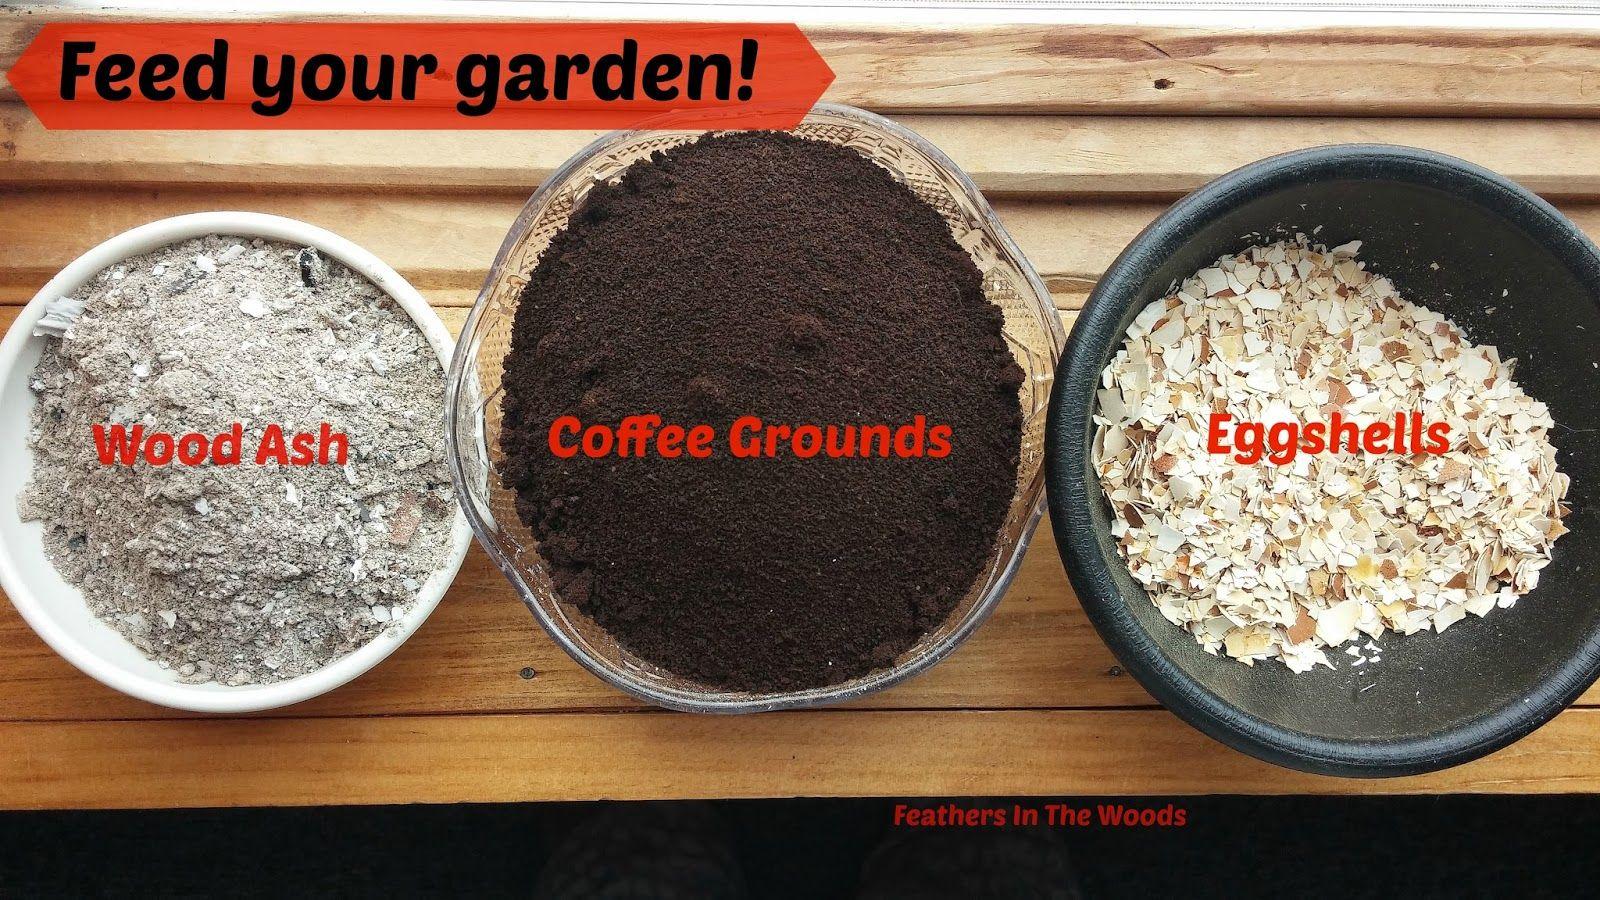 Feed Your Garden Coffee Grounds Eggshells Wood Ash Coffee Grounds Organic Vegetables Egg Shells